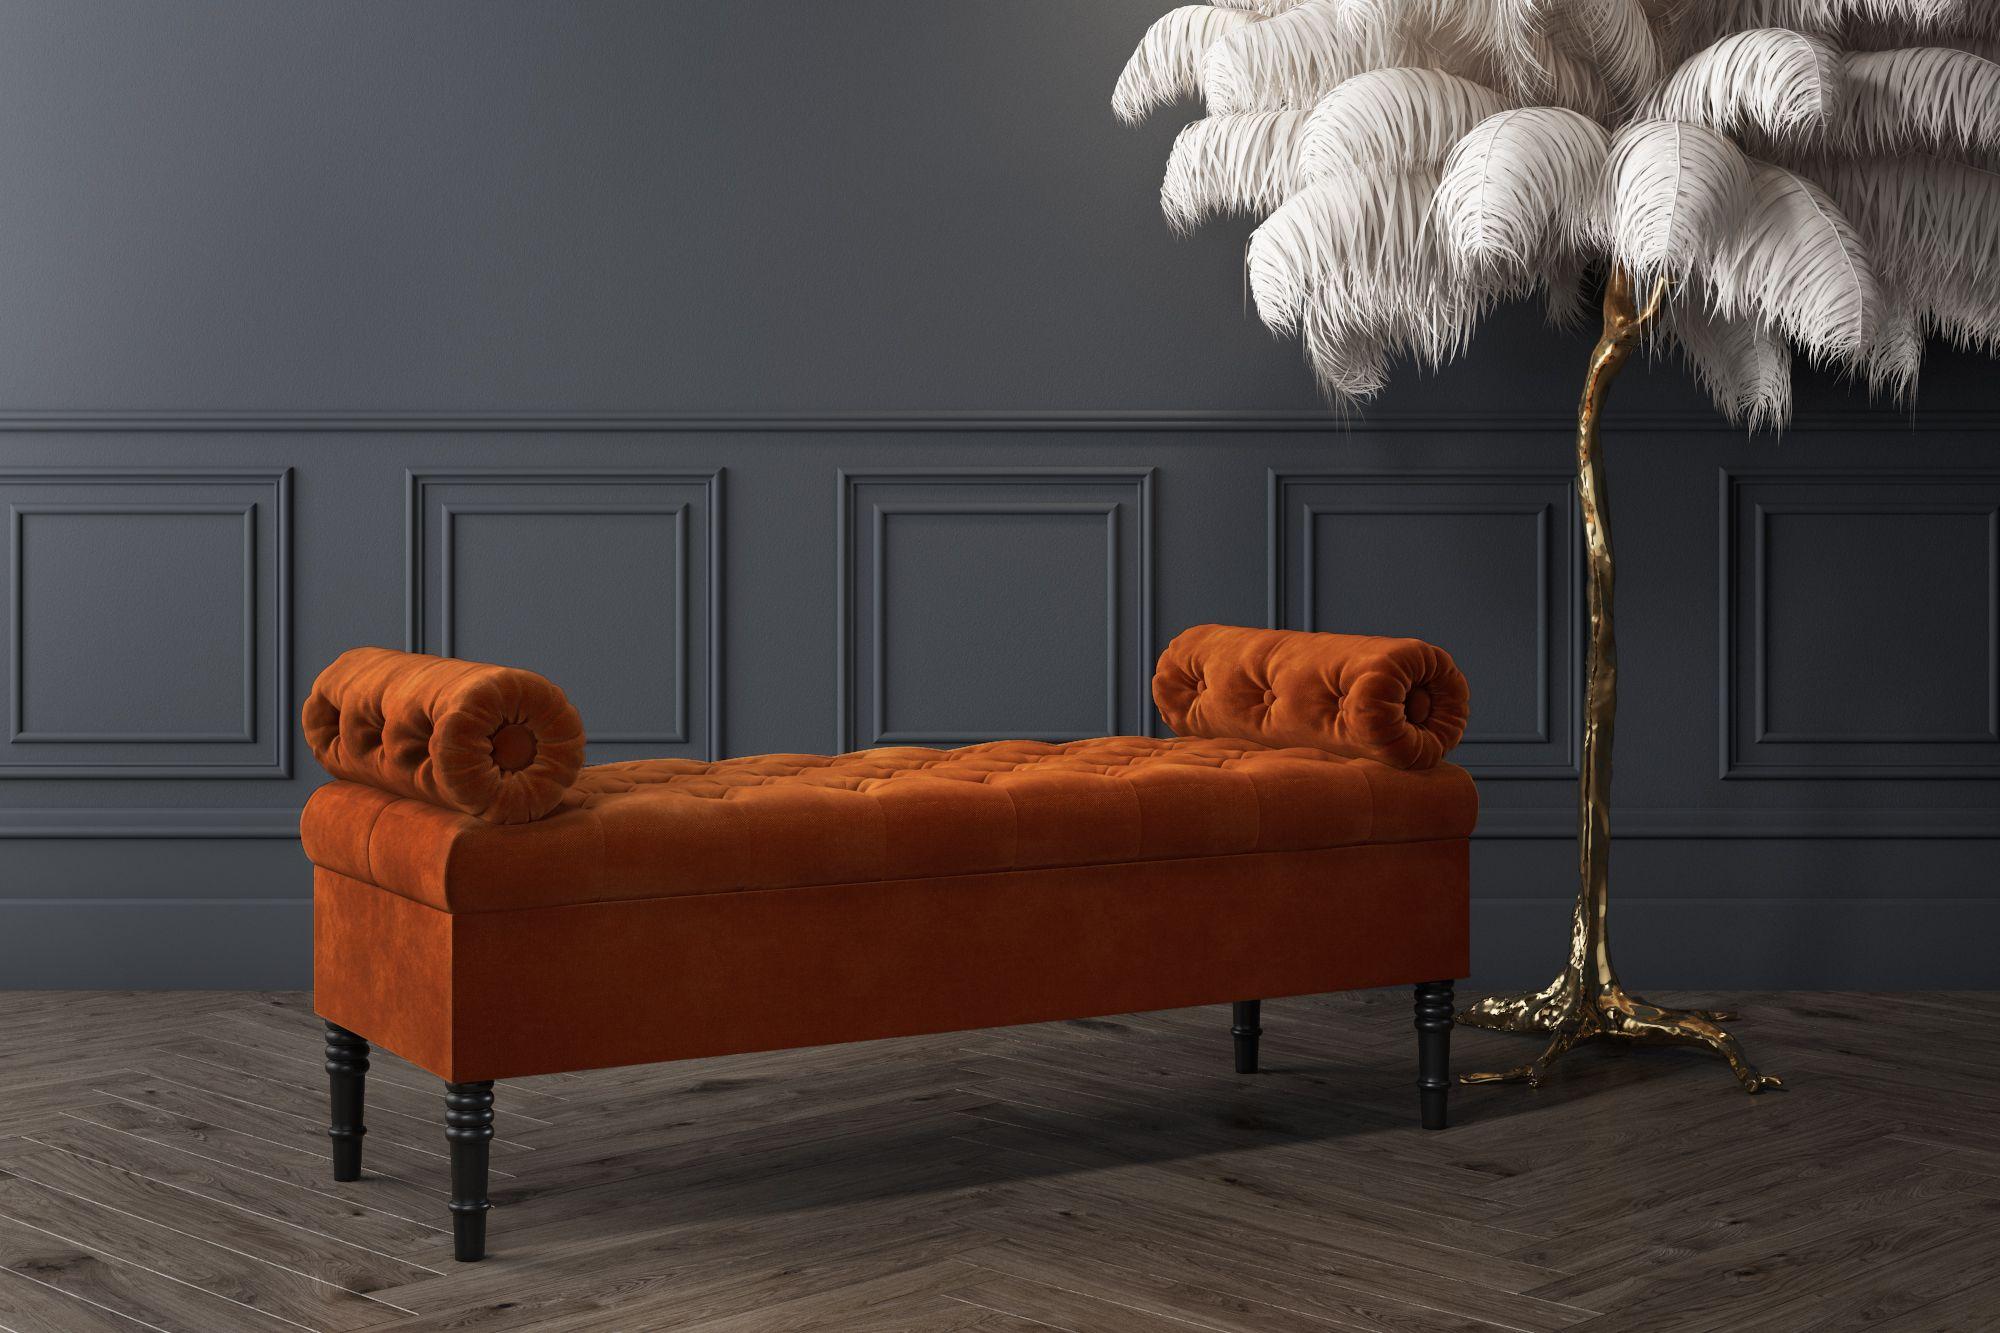 Pleasing Safina Burnt Orange Velvet Ottoman Storage Bench In 2019 Frankydiablos Diy Chair Ideas Frankydiabloscom